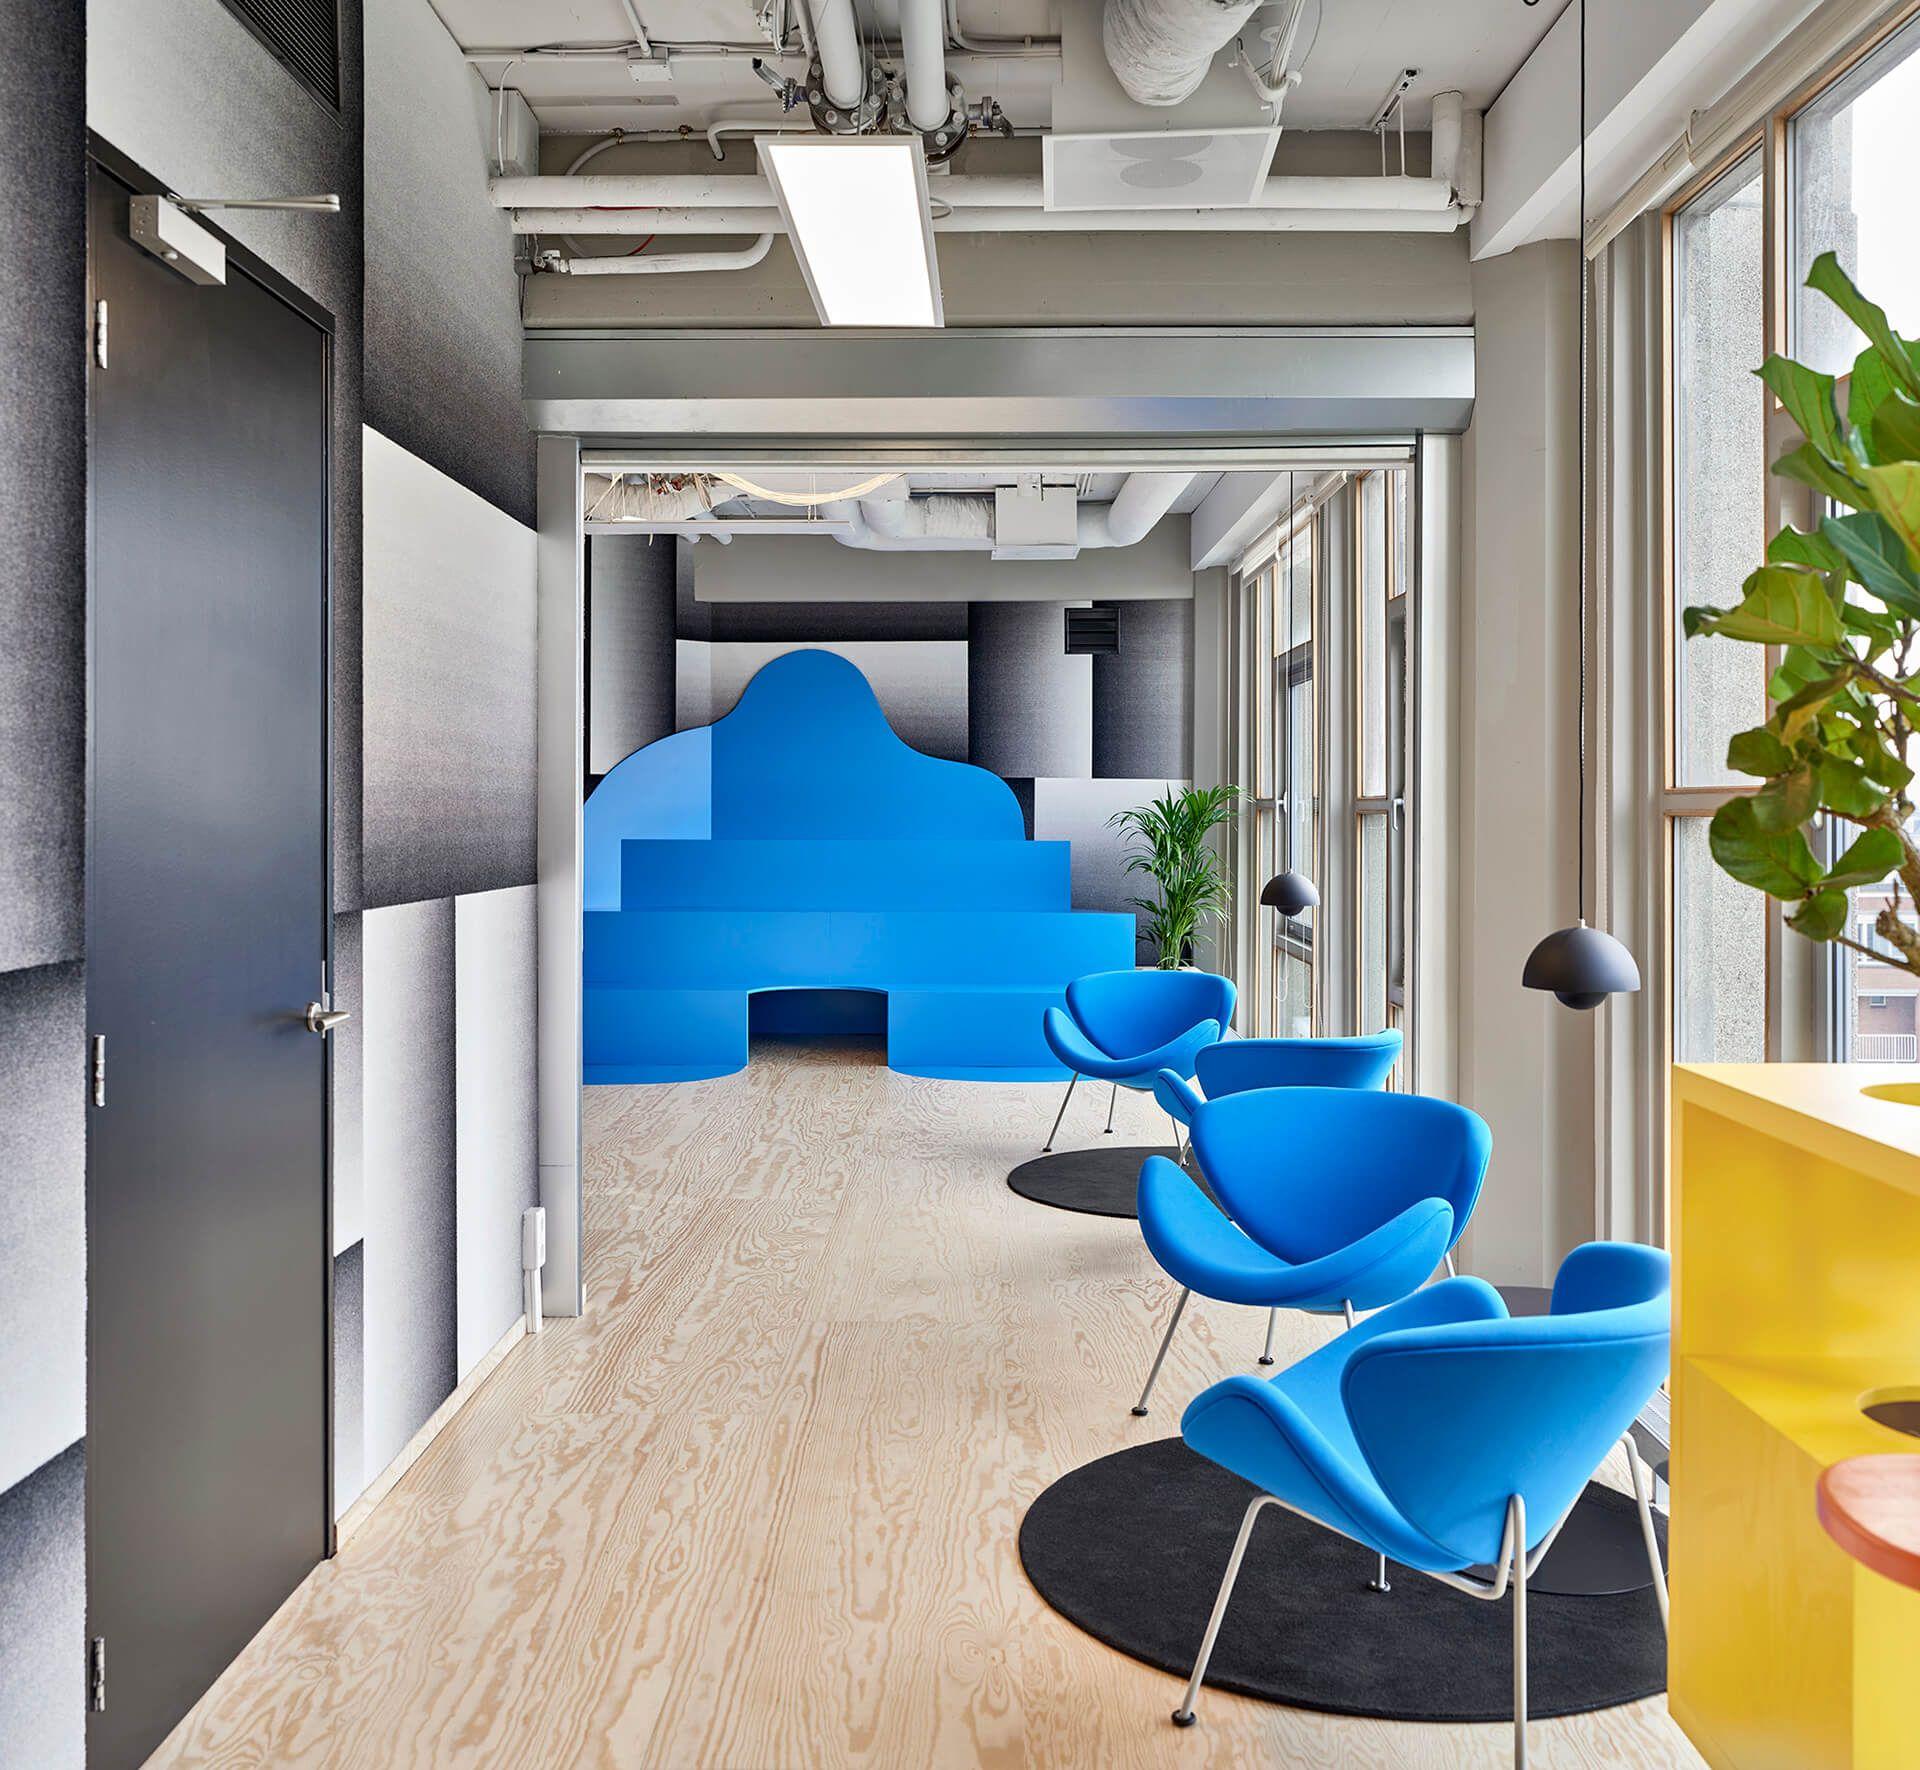 Urban jungle office, Burle Marx style StudioSpass takes